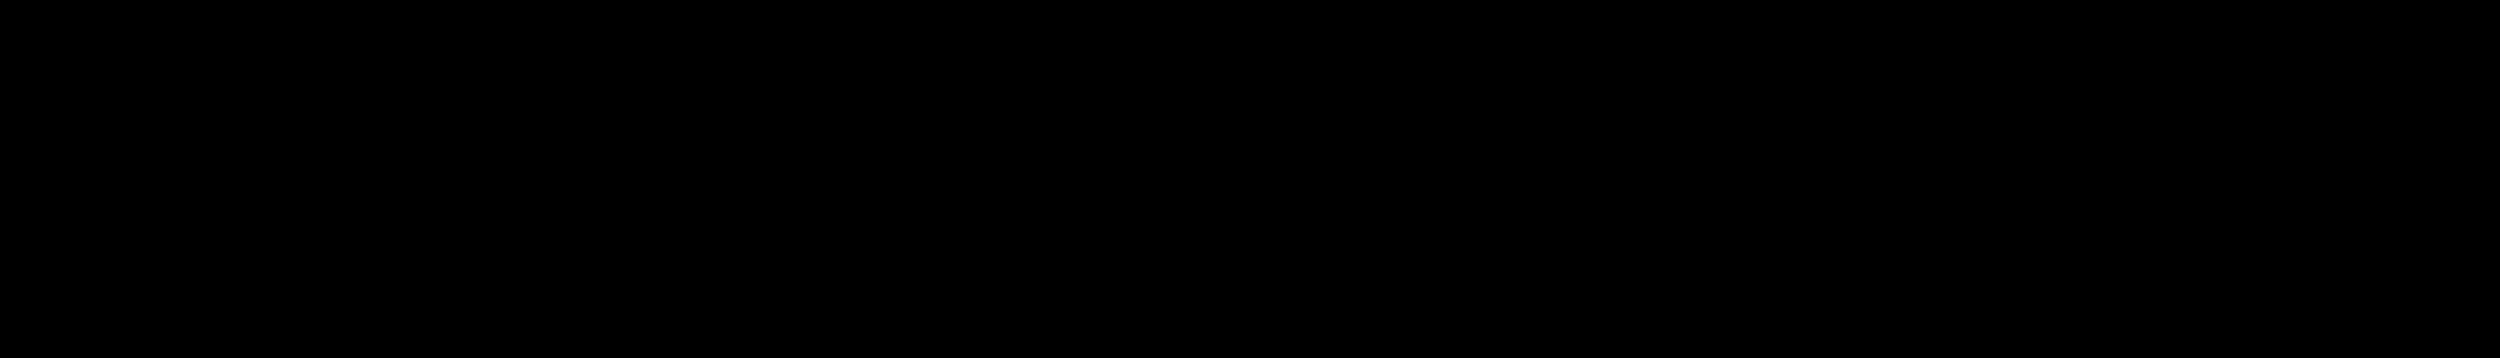 Tidal_logo.png